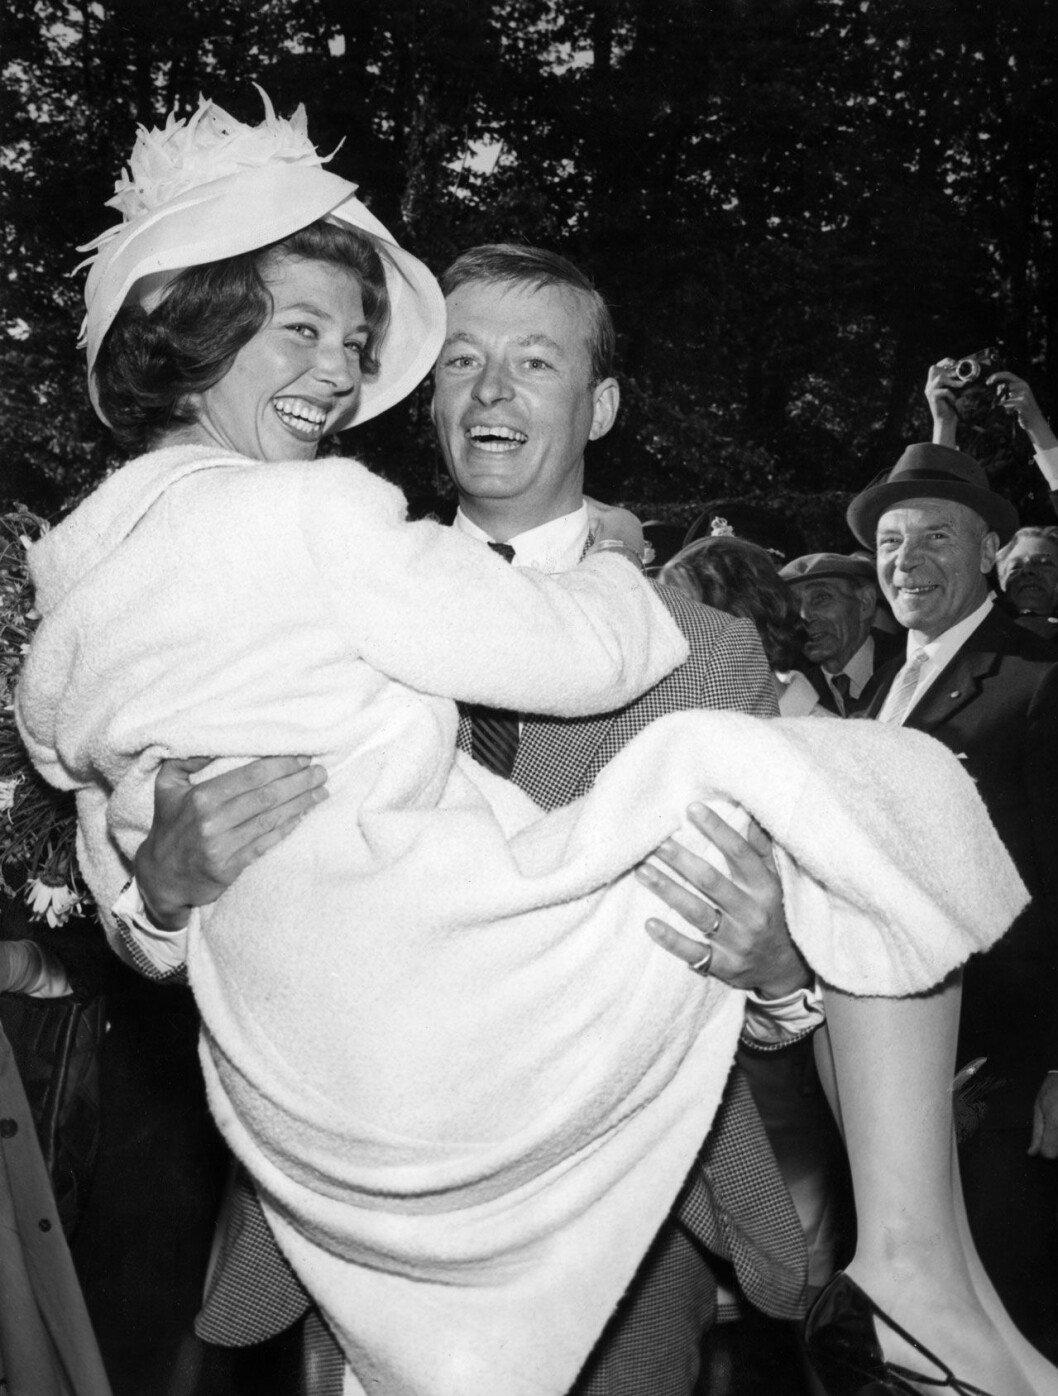 Prinsessan Désirée och friherre Niclas Silfverschiöld, nygifta 1964.